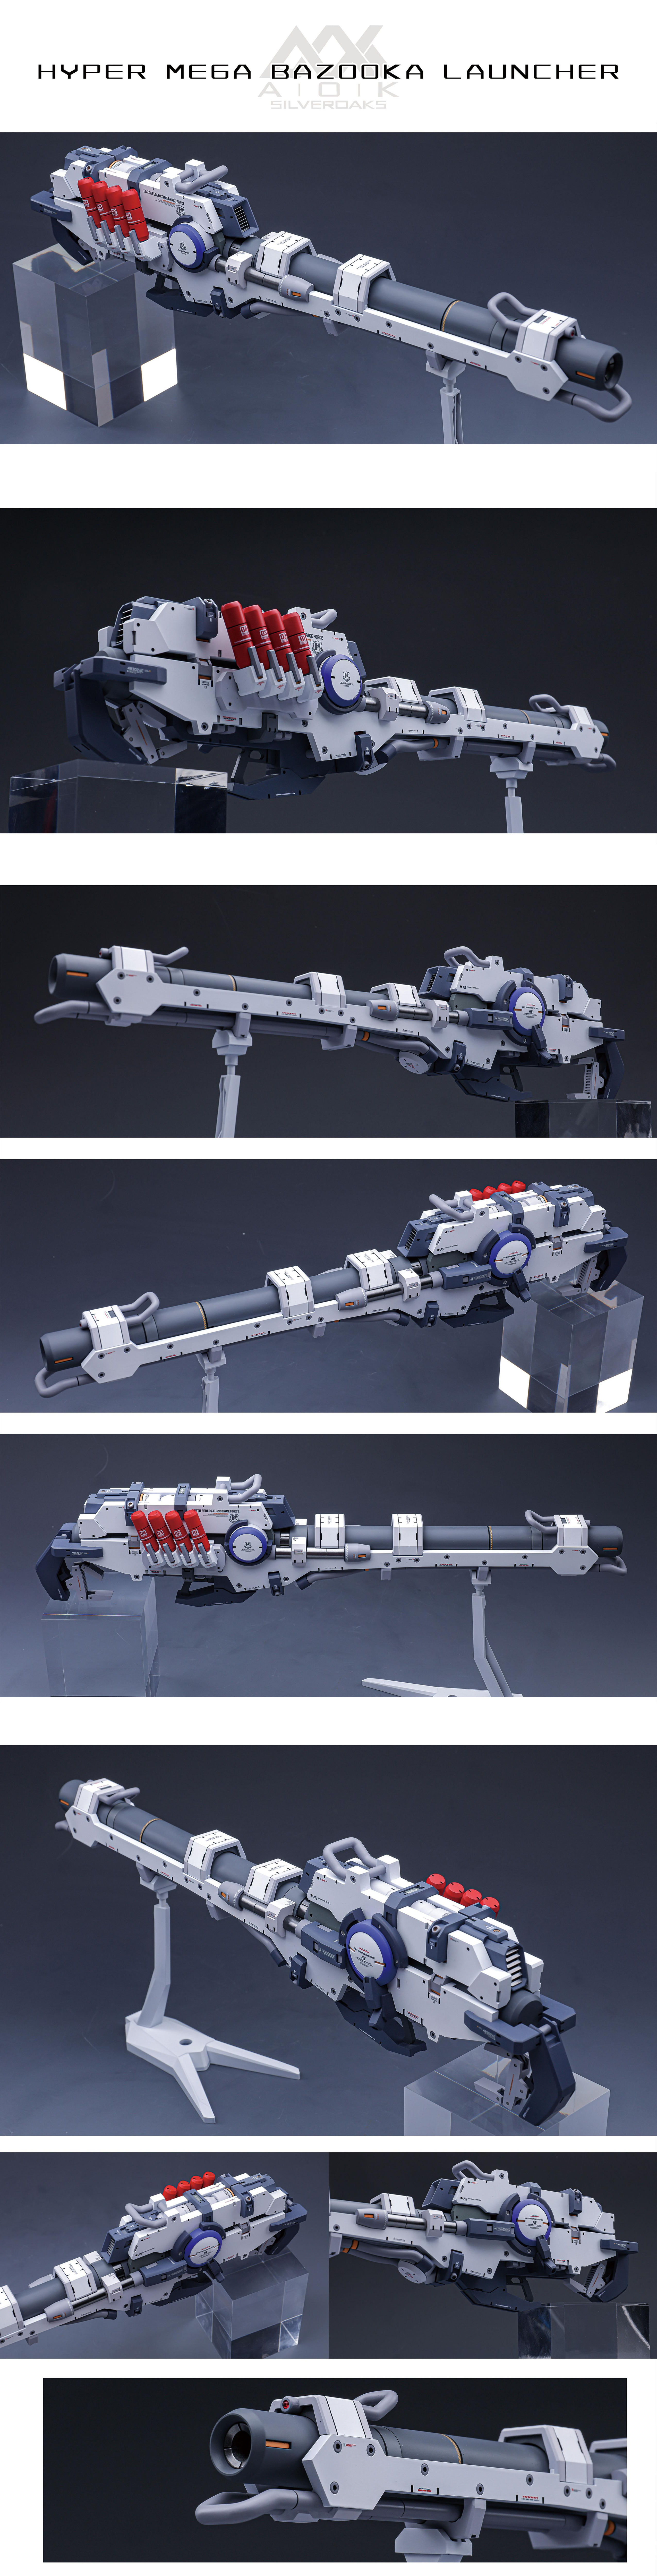 G788_AOK_silveroaks_RG_HG_nu_mega_launcher_005.jpg